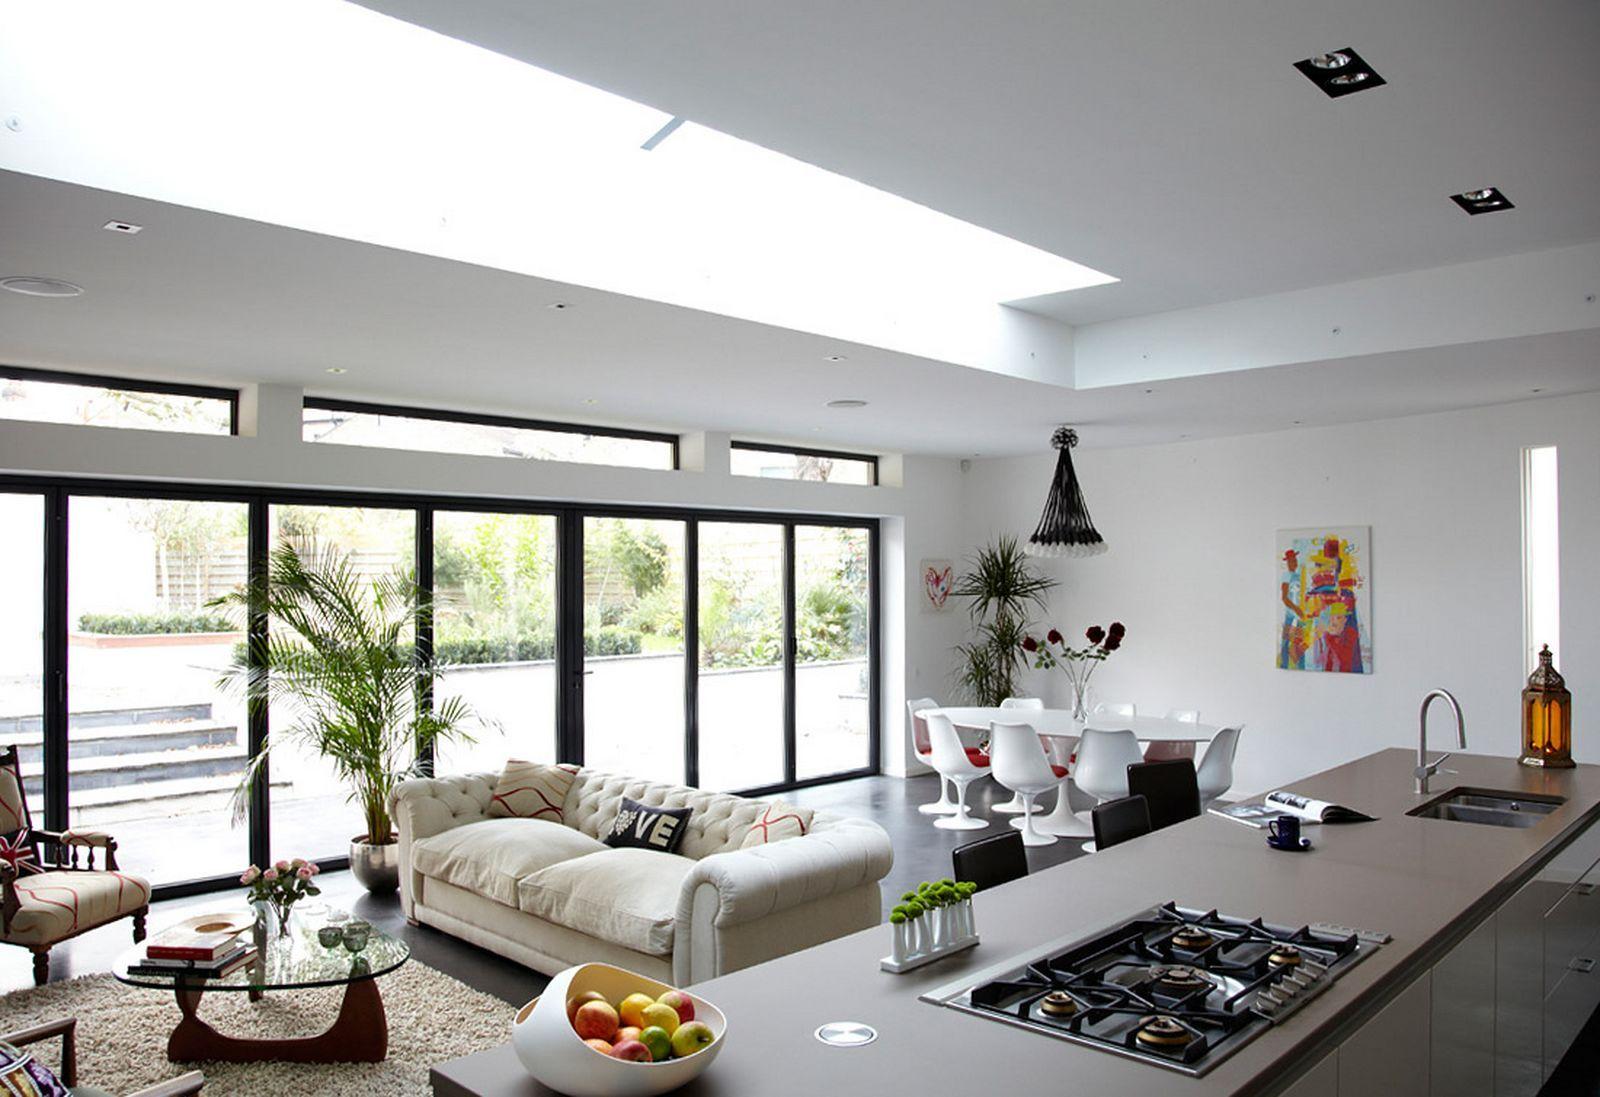 Kitchen-luxurious-living-room-with-kitchen-design-inspiration.jpg ...